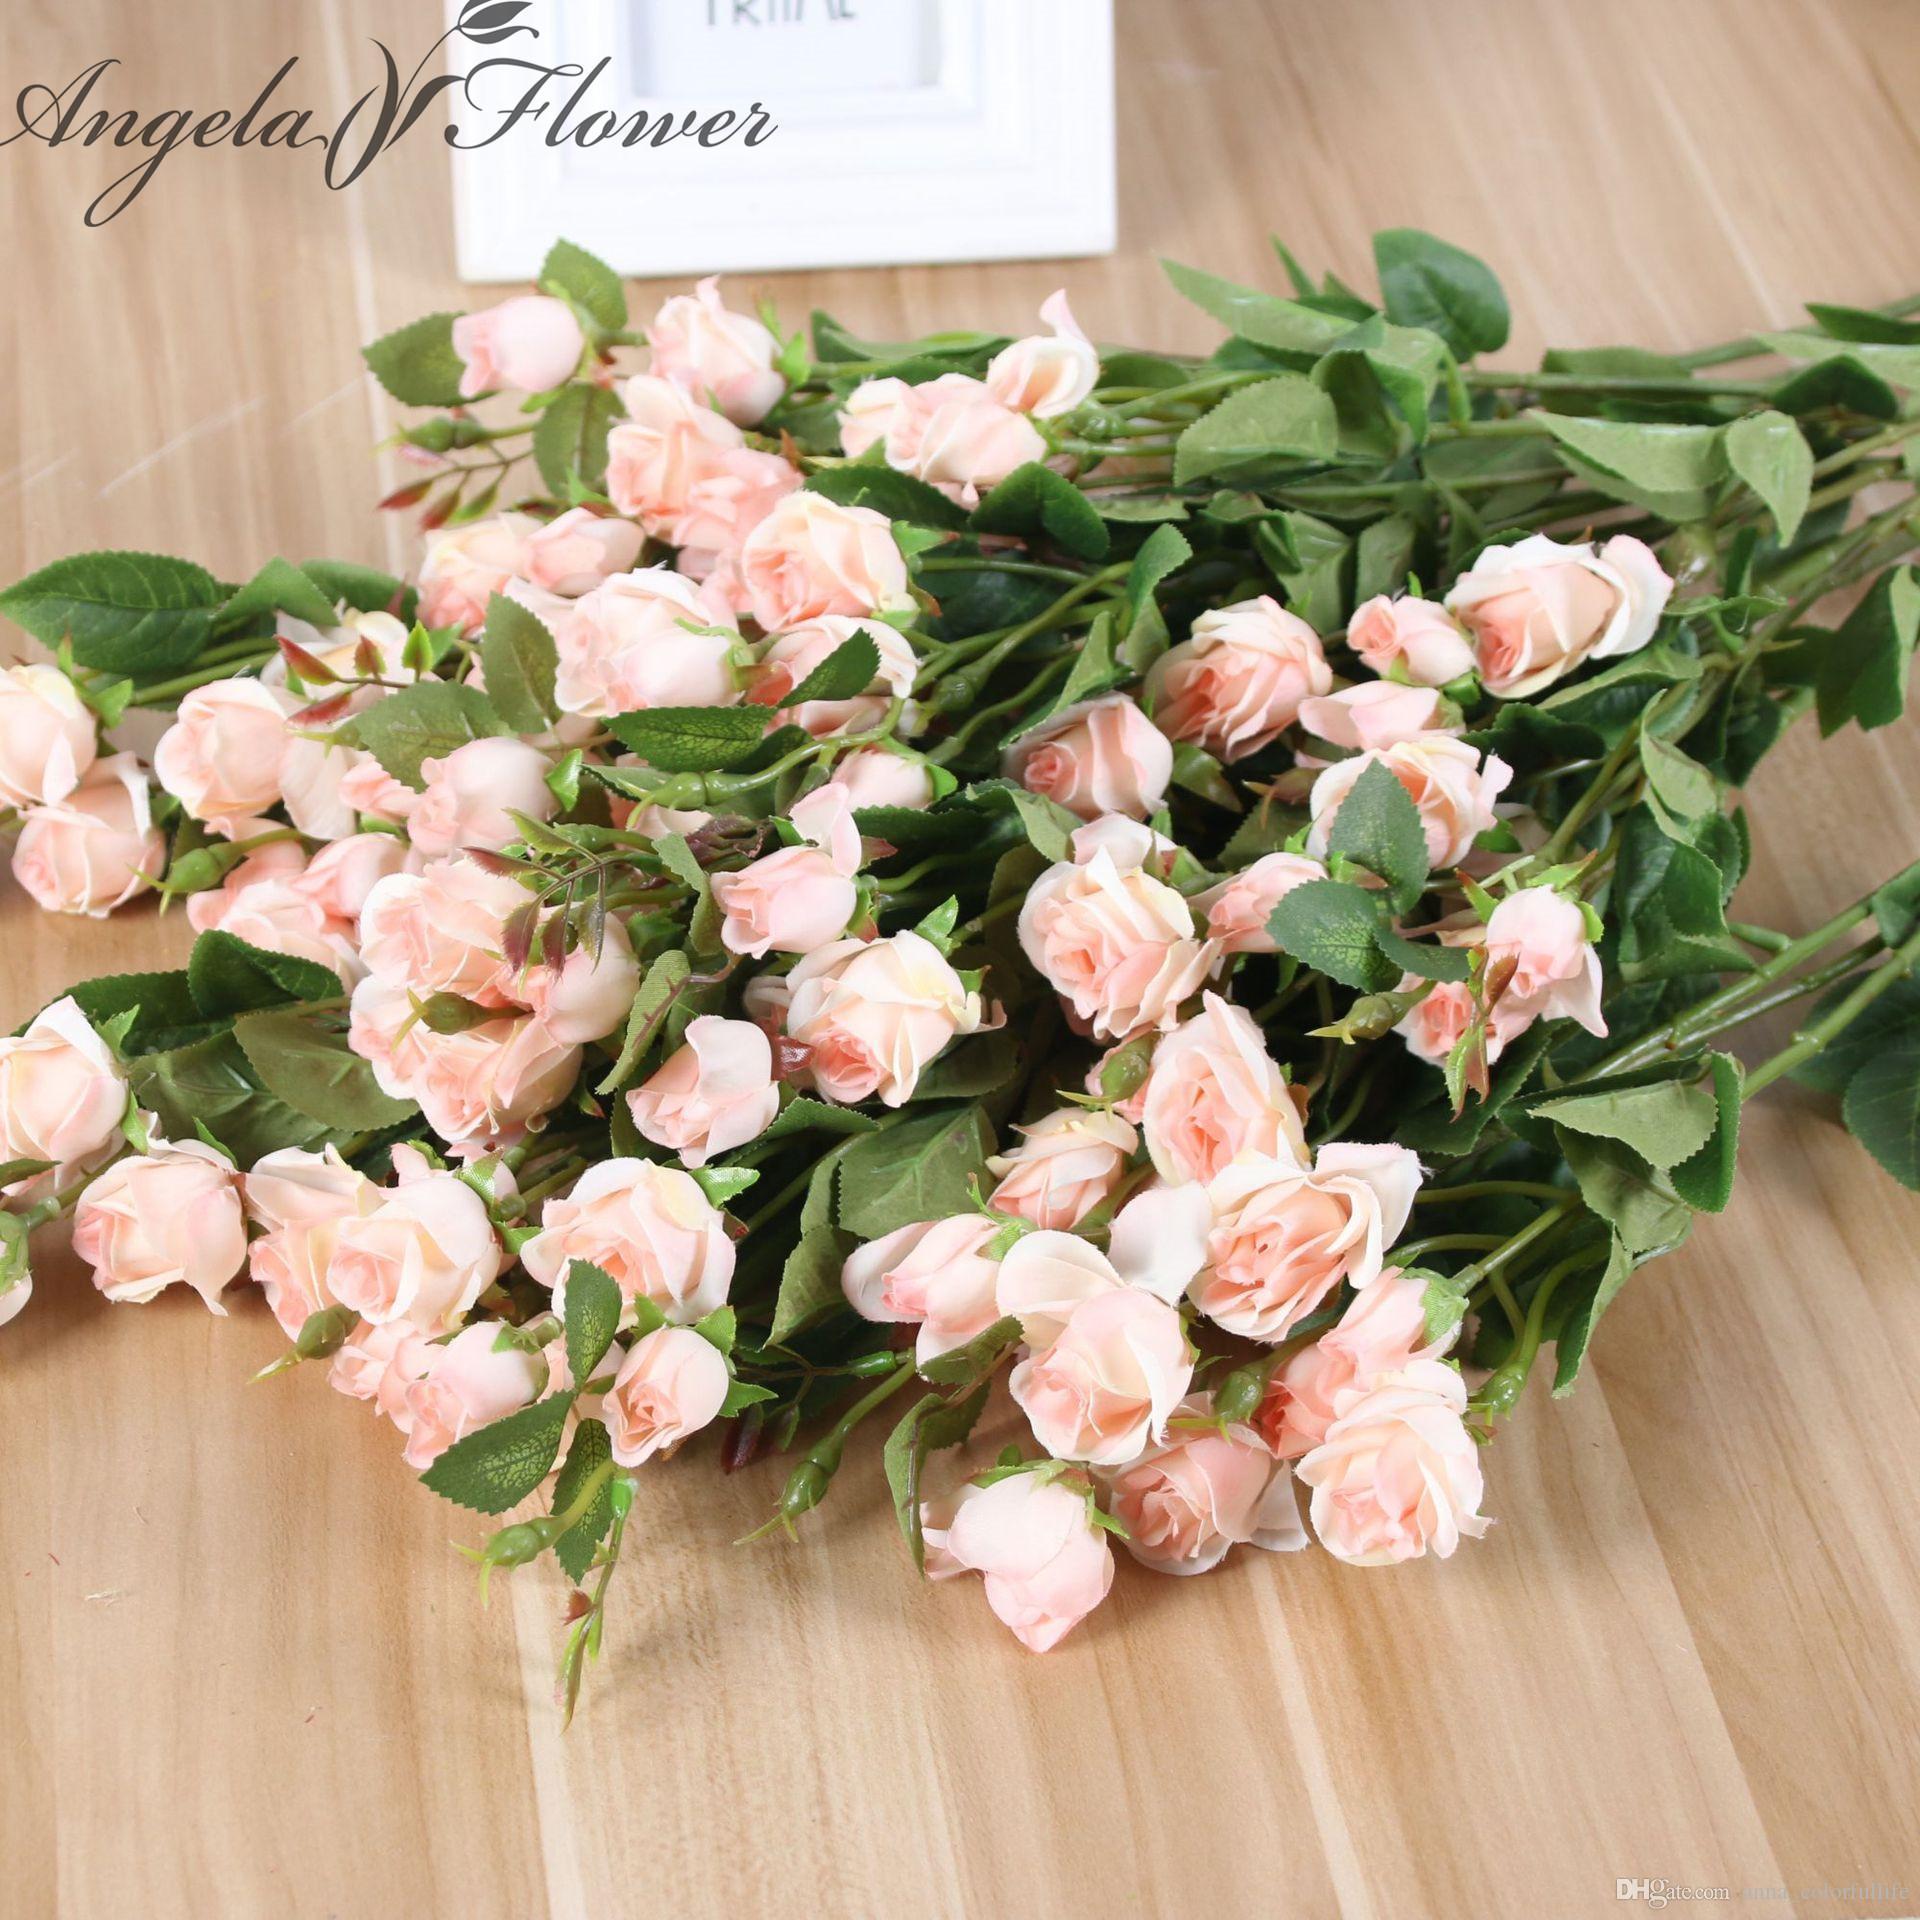 8 Pcs Bouquet 71 5cm Silk Small Rose Bud Diy Wedding Home Desk Garden Bedroom Decor Artificial Flower Rose Fake Flores Rose